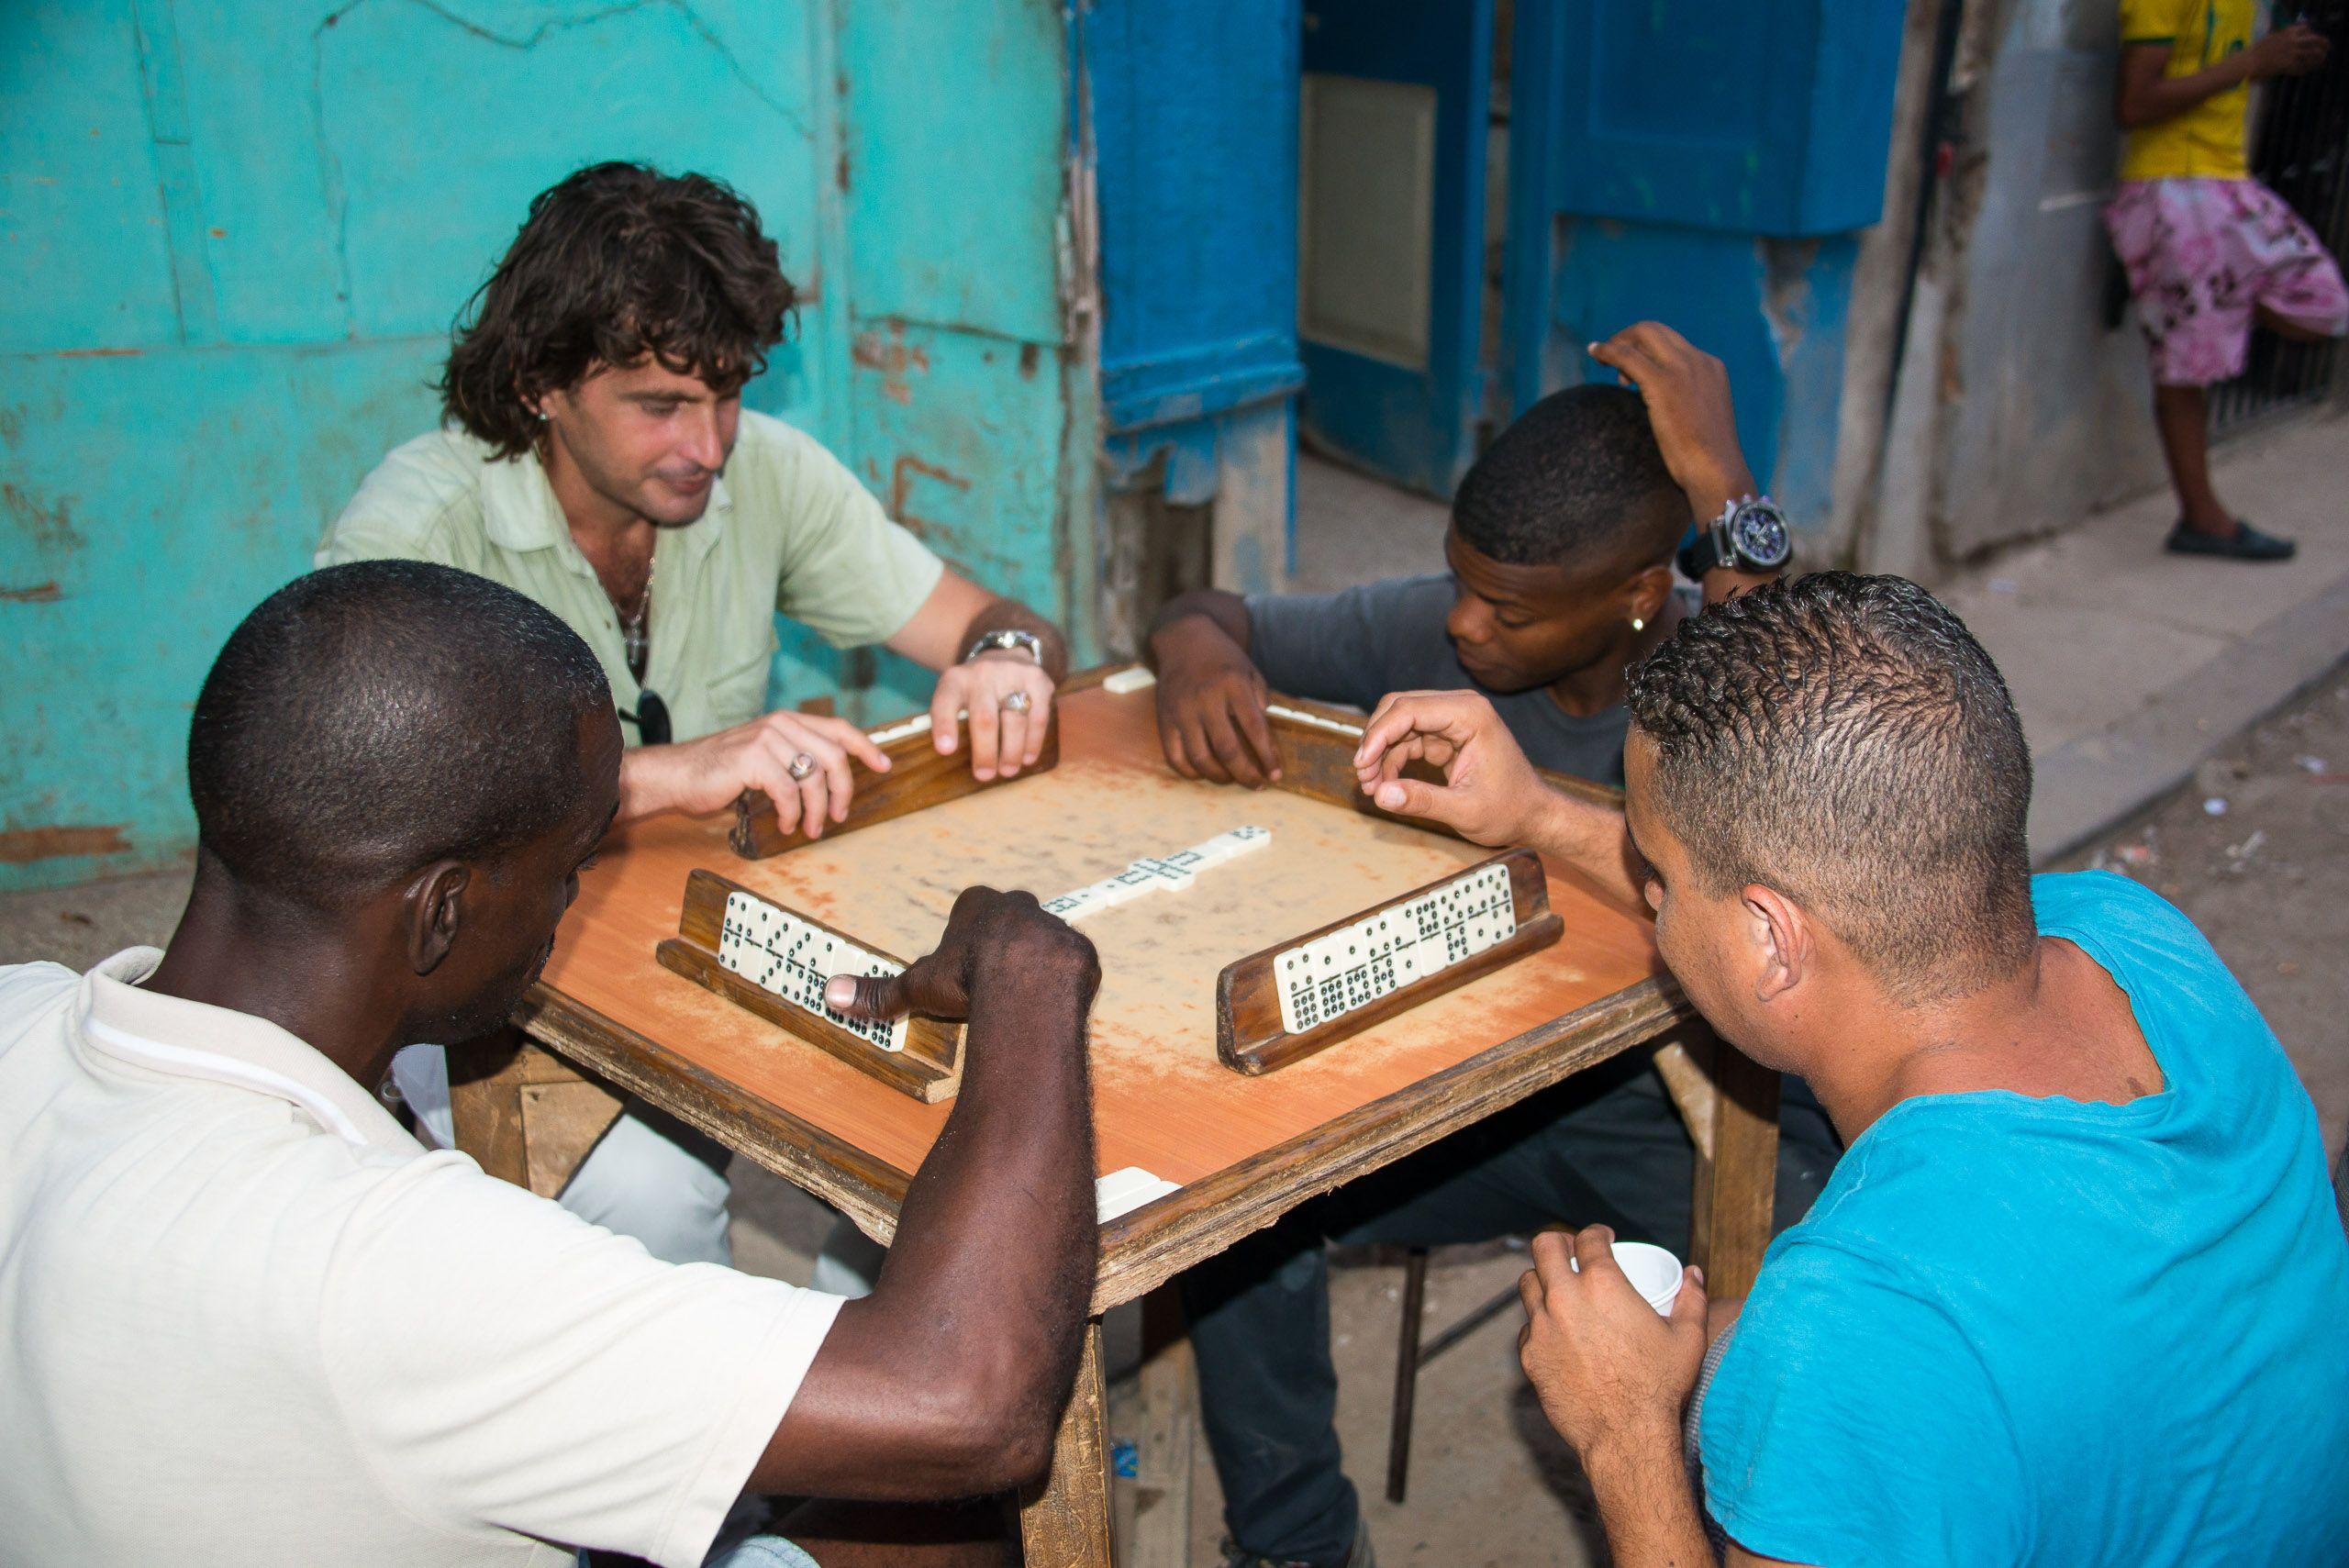 Domino Players. Havana, Cuba